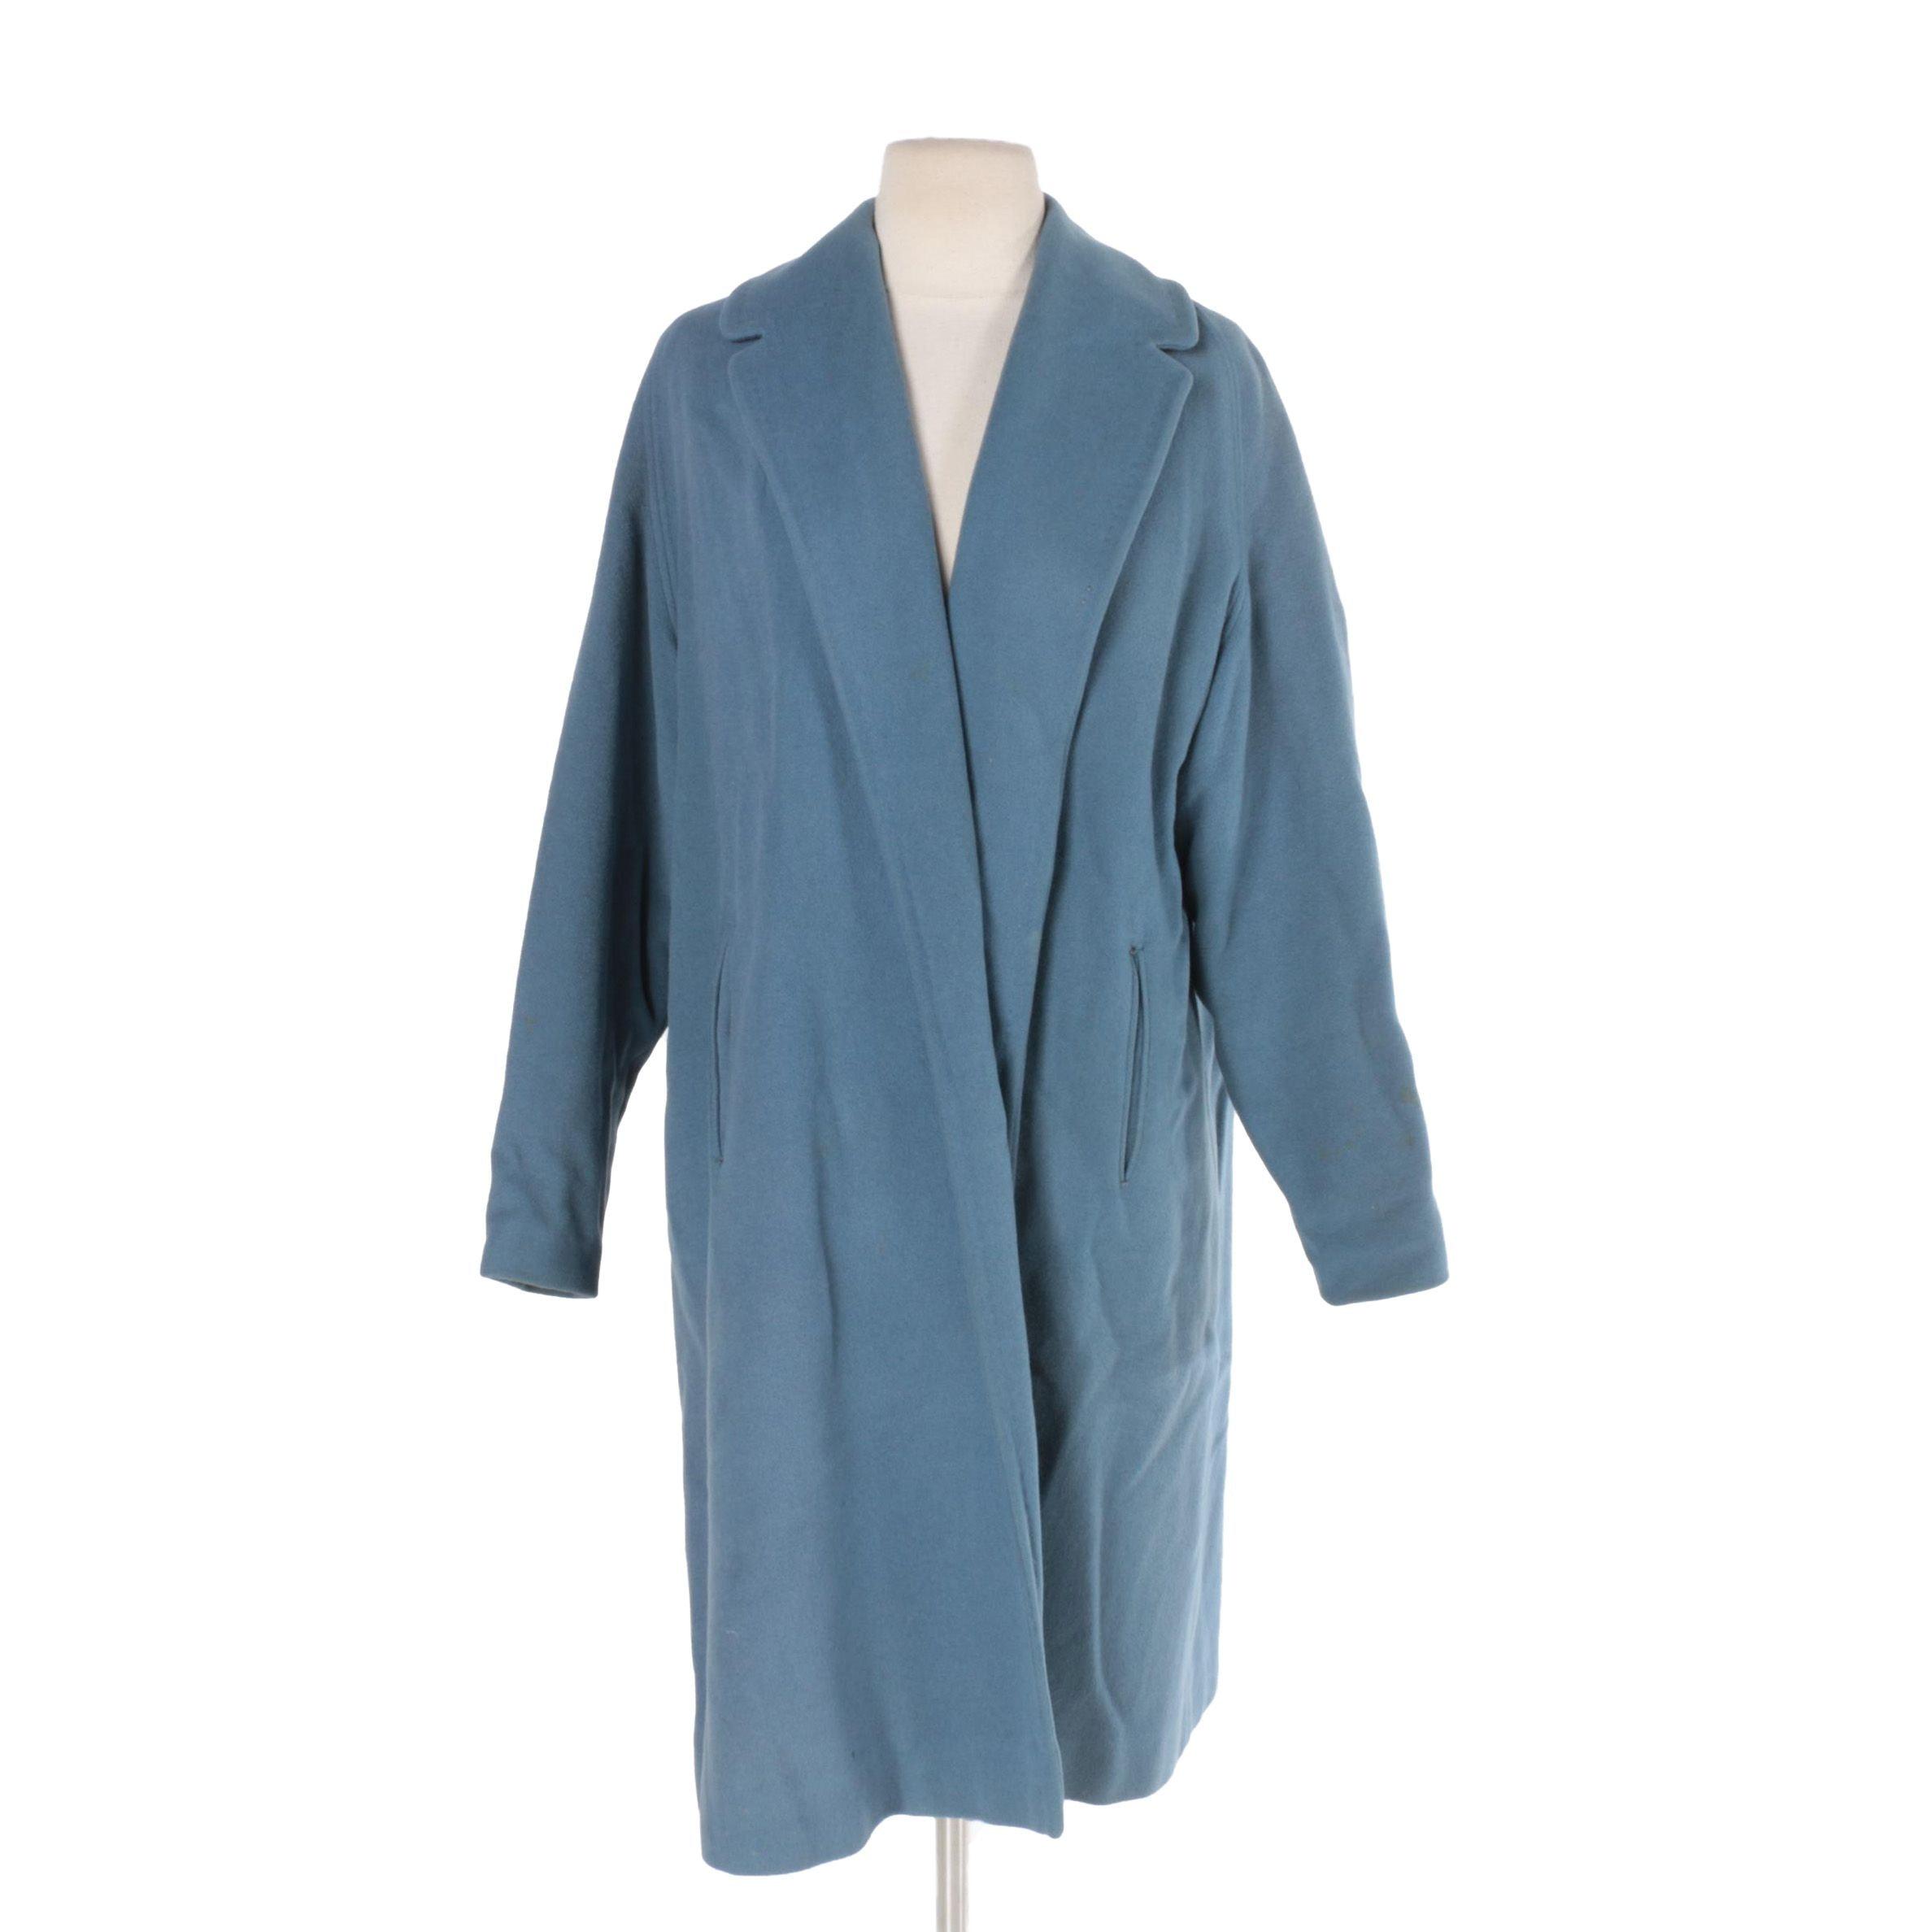 Women's Vintage Blue Cashmere Overcoat